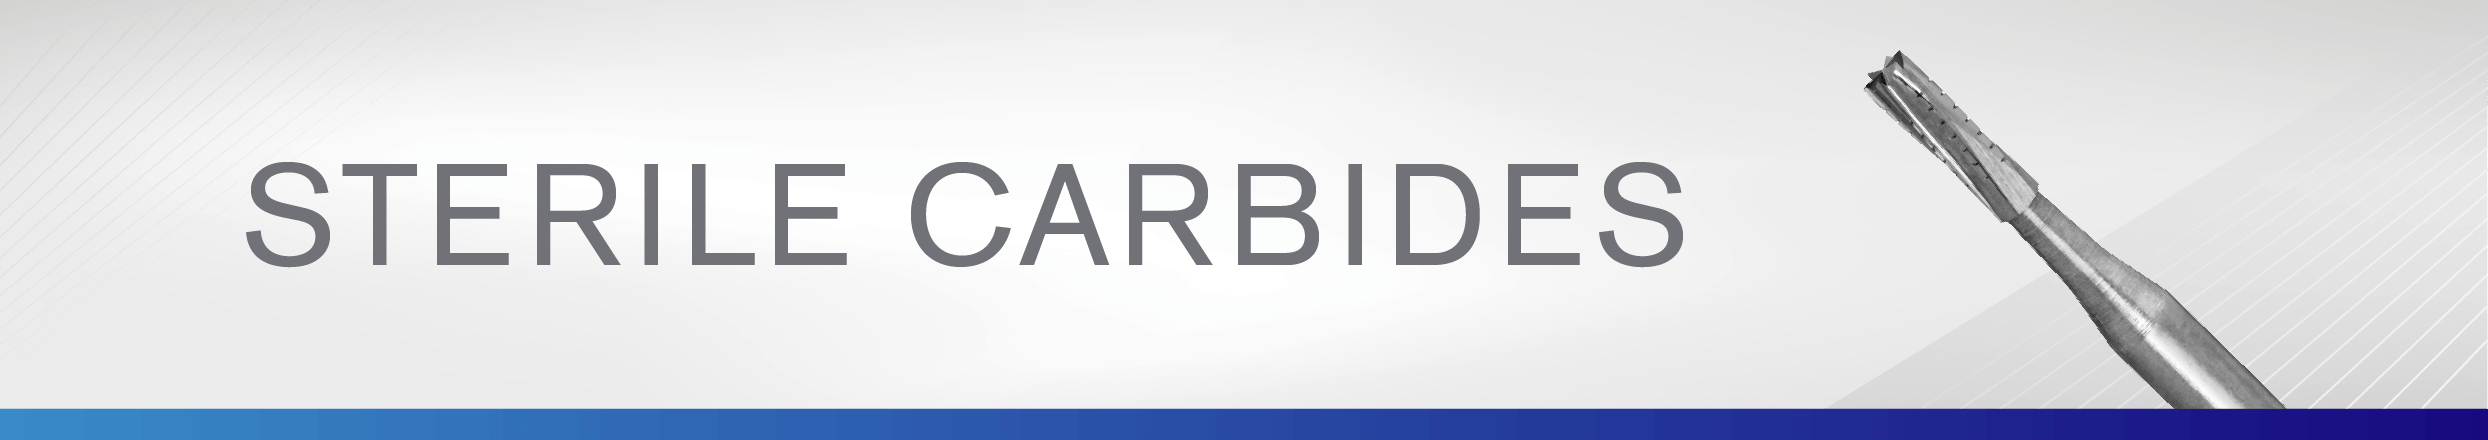 Sterile Carbides